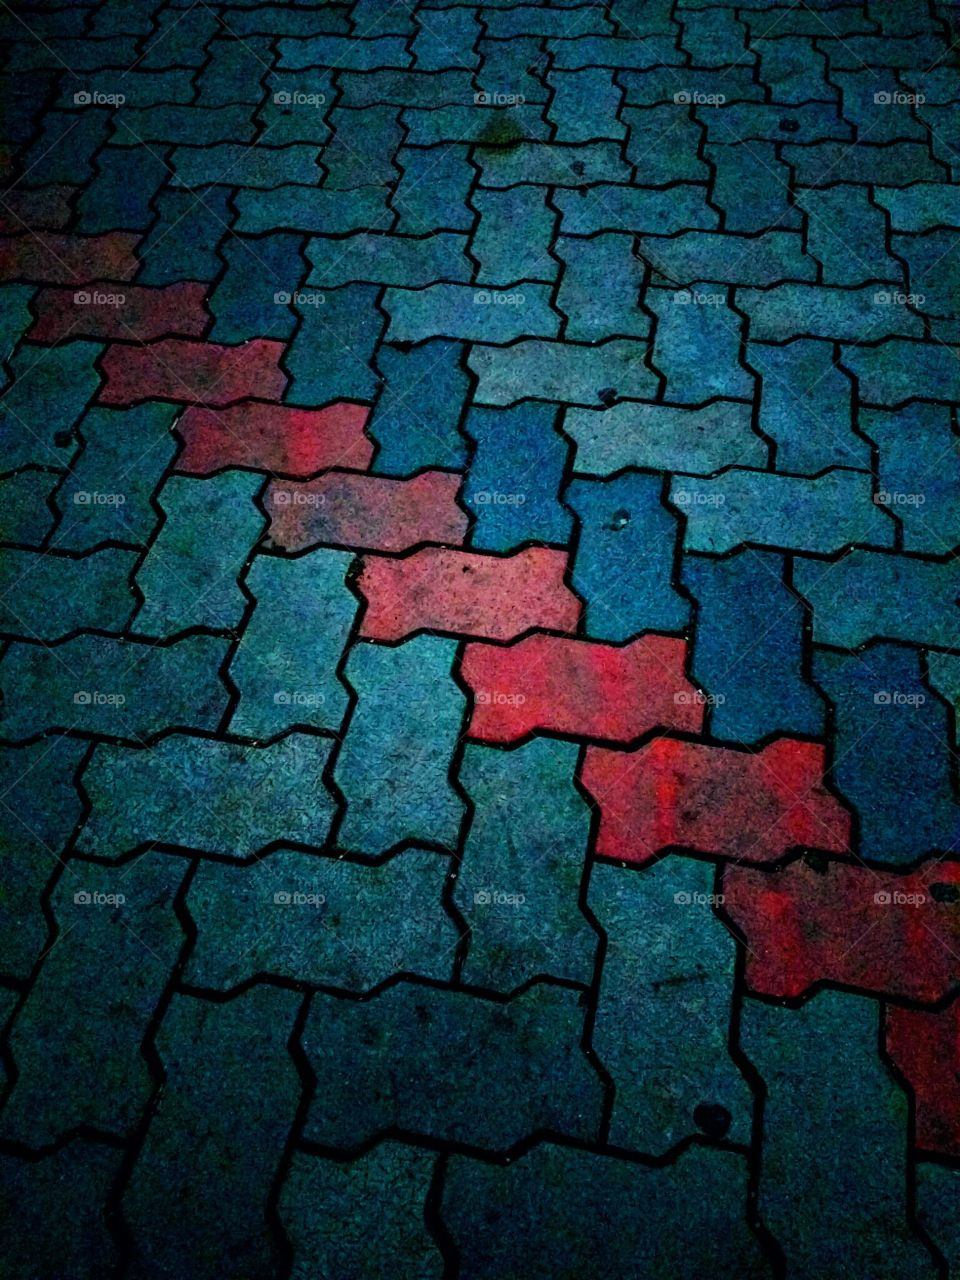 ground tile